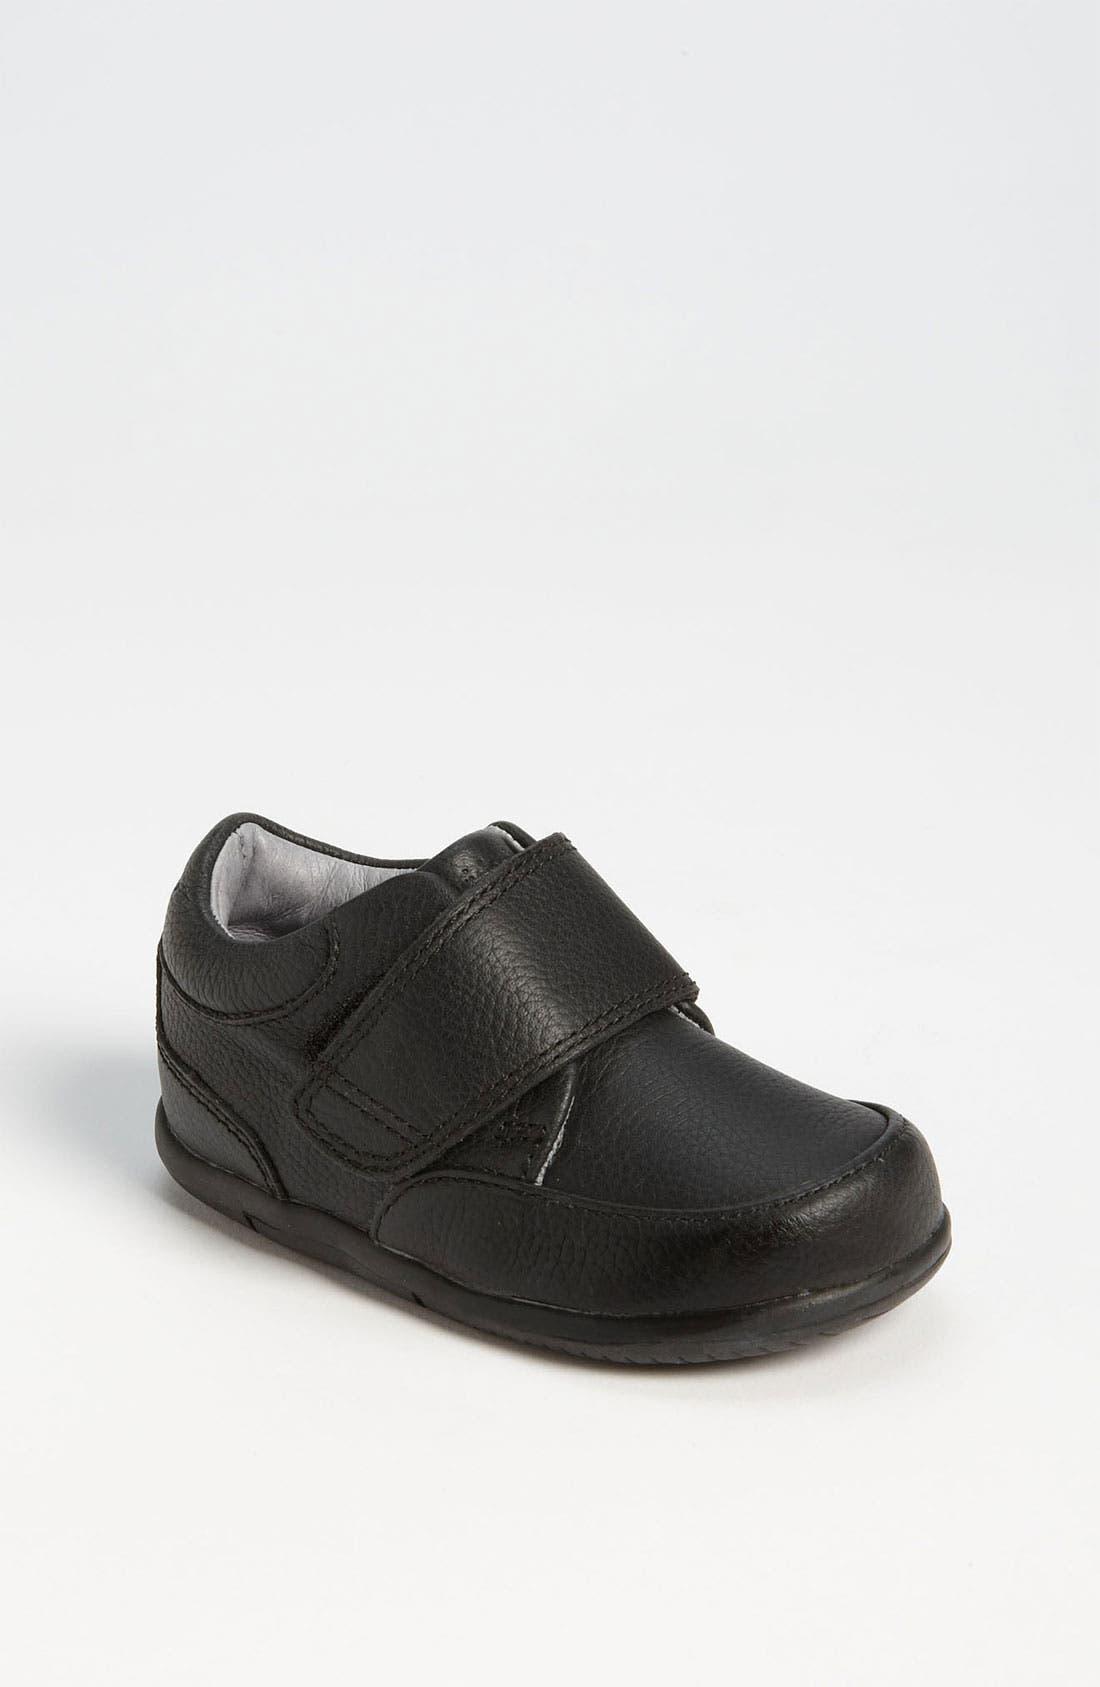 Alternate Image 1 Selected - Stride Rite 'Ross' Dress Shoe (Baby, Walker & Toddler)